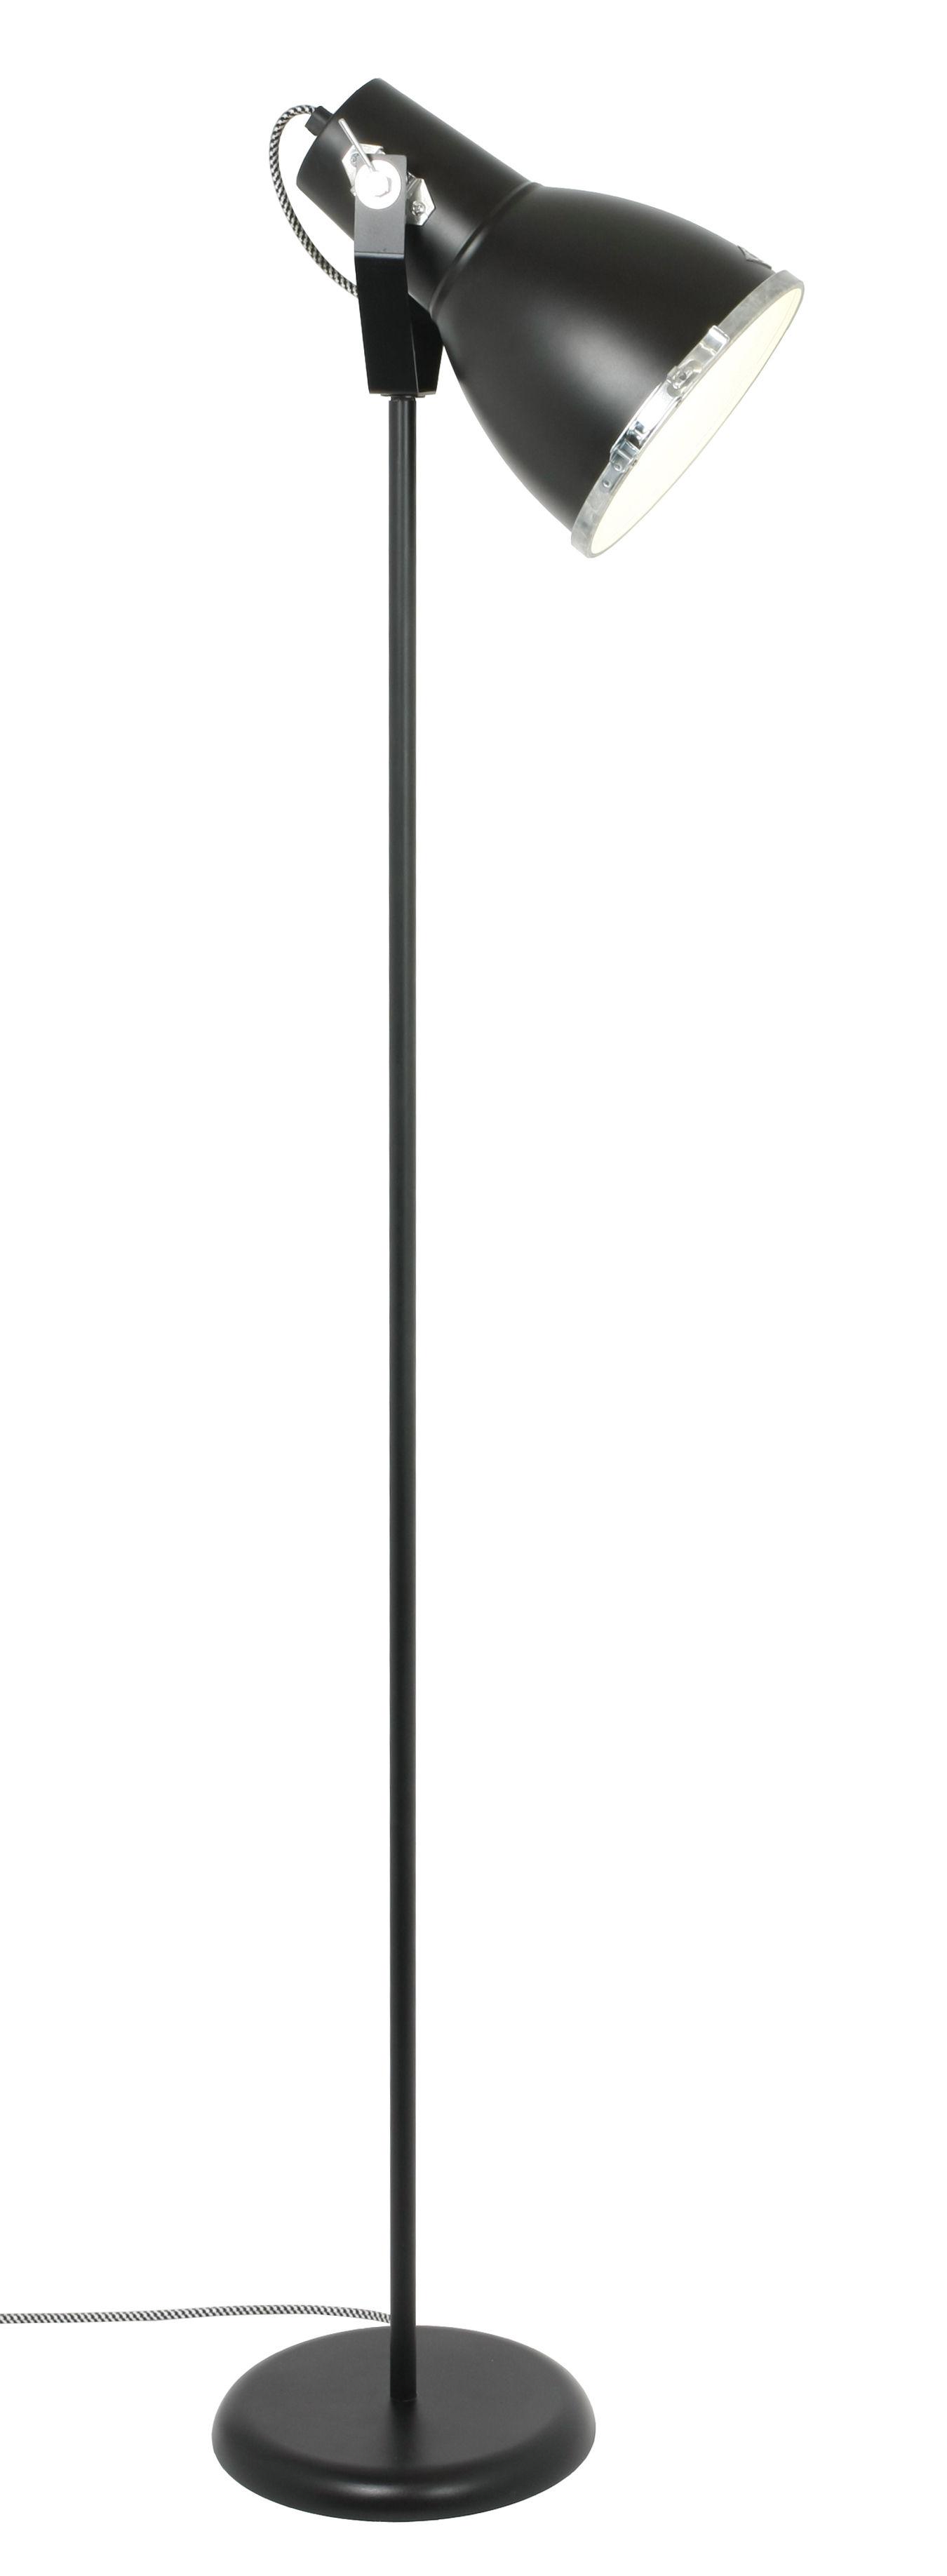 Illuminazione - Lampade da terra - Lampada a stelo Stirrup 2 - / Metallo - H 158 cm - Orientabile di Original BTC - Nero - Alluminio